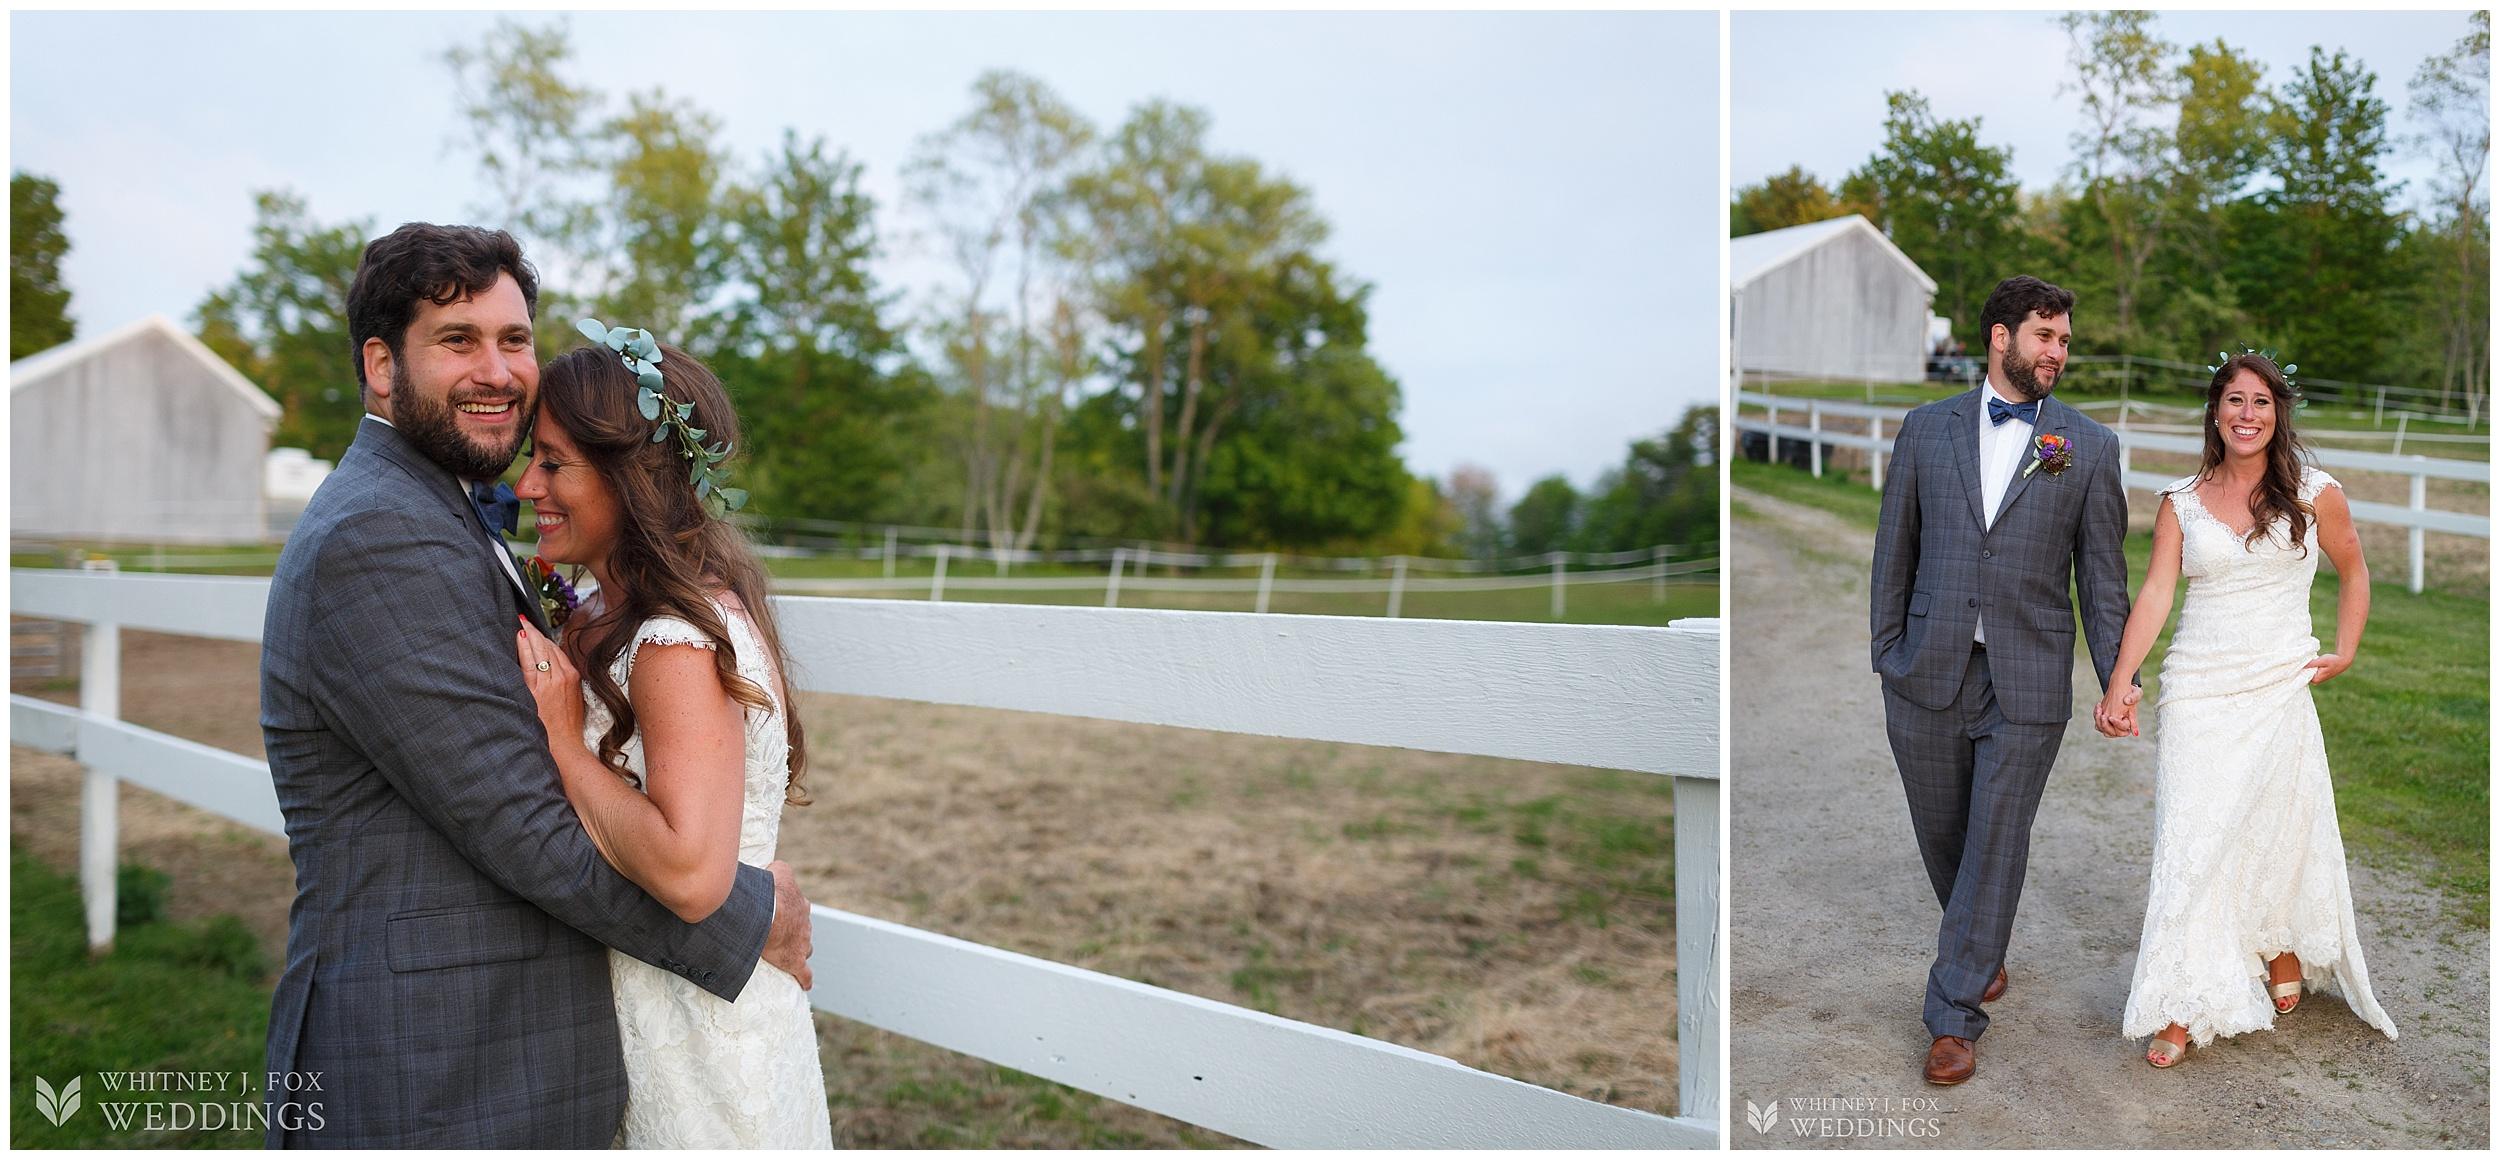 88_174_tai_josh_the_homestead_rest_be_thankful_farm_lyman_maine_photographer_whitney_j_fox_weddings_0570.jpg